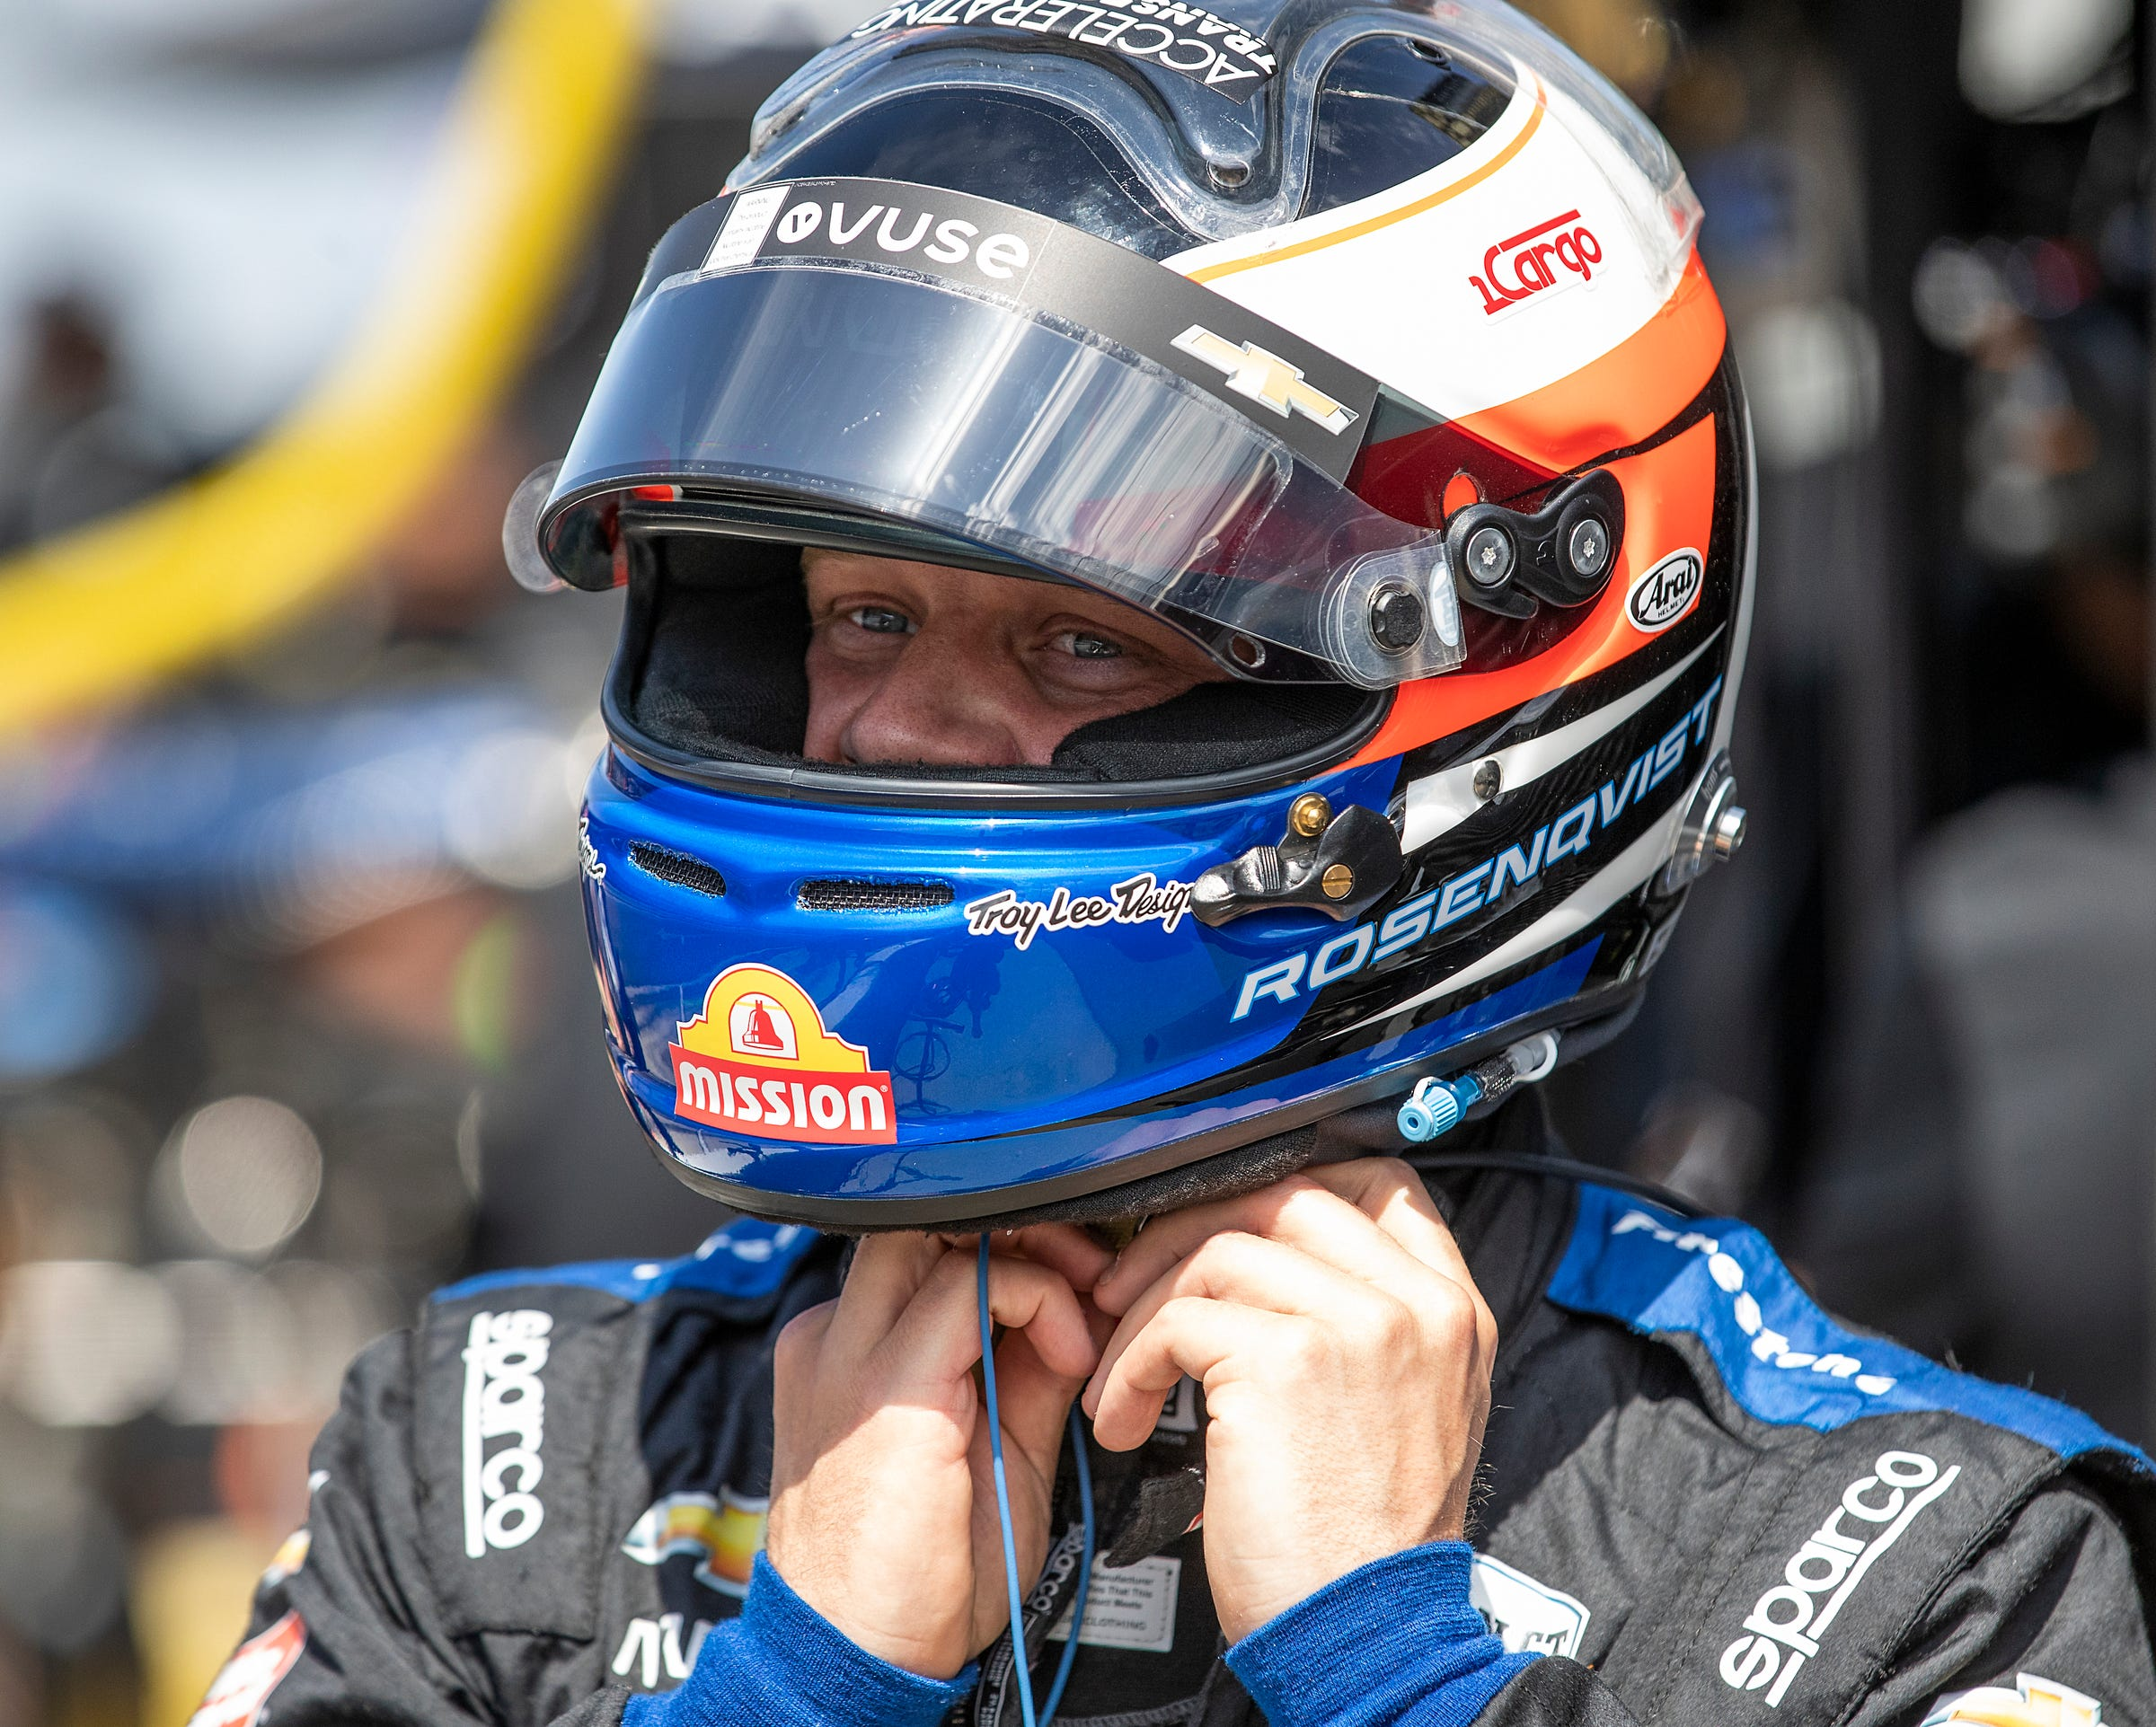 Oliver Askew replaces Felix Rosenqvist in Detroit Race 2 after Swede hospitalized following nasty crash